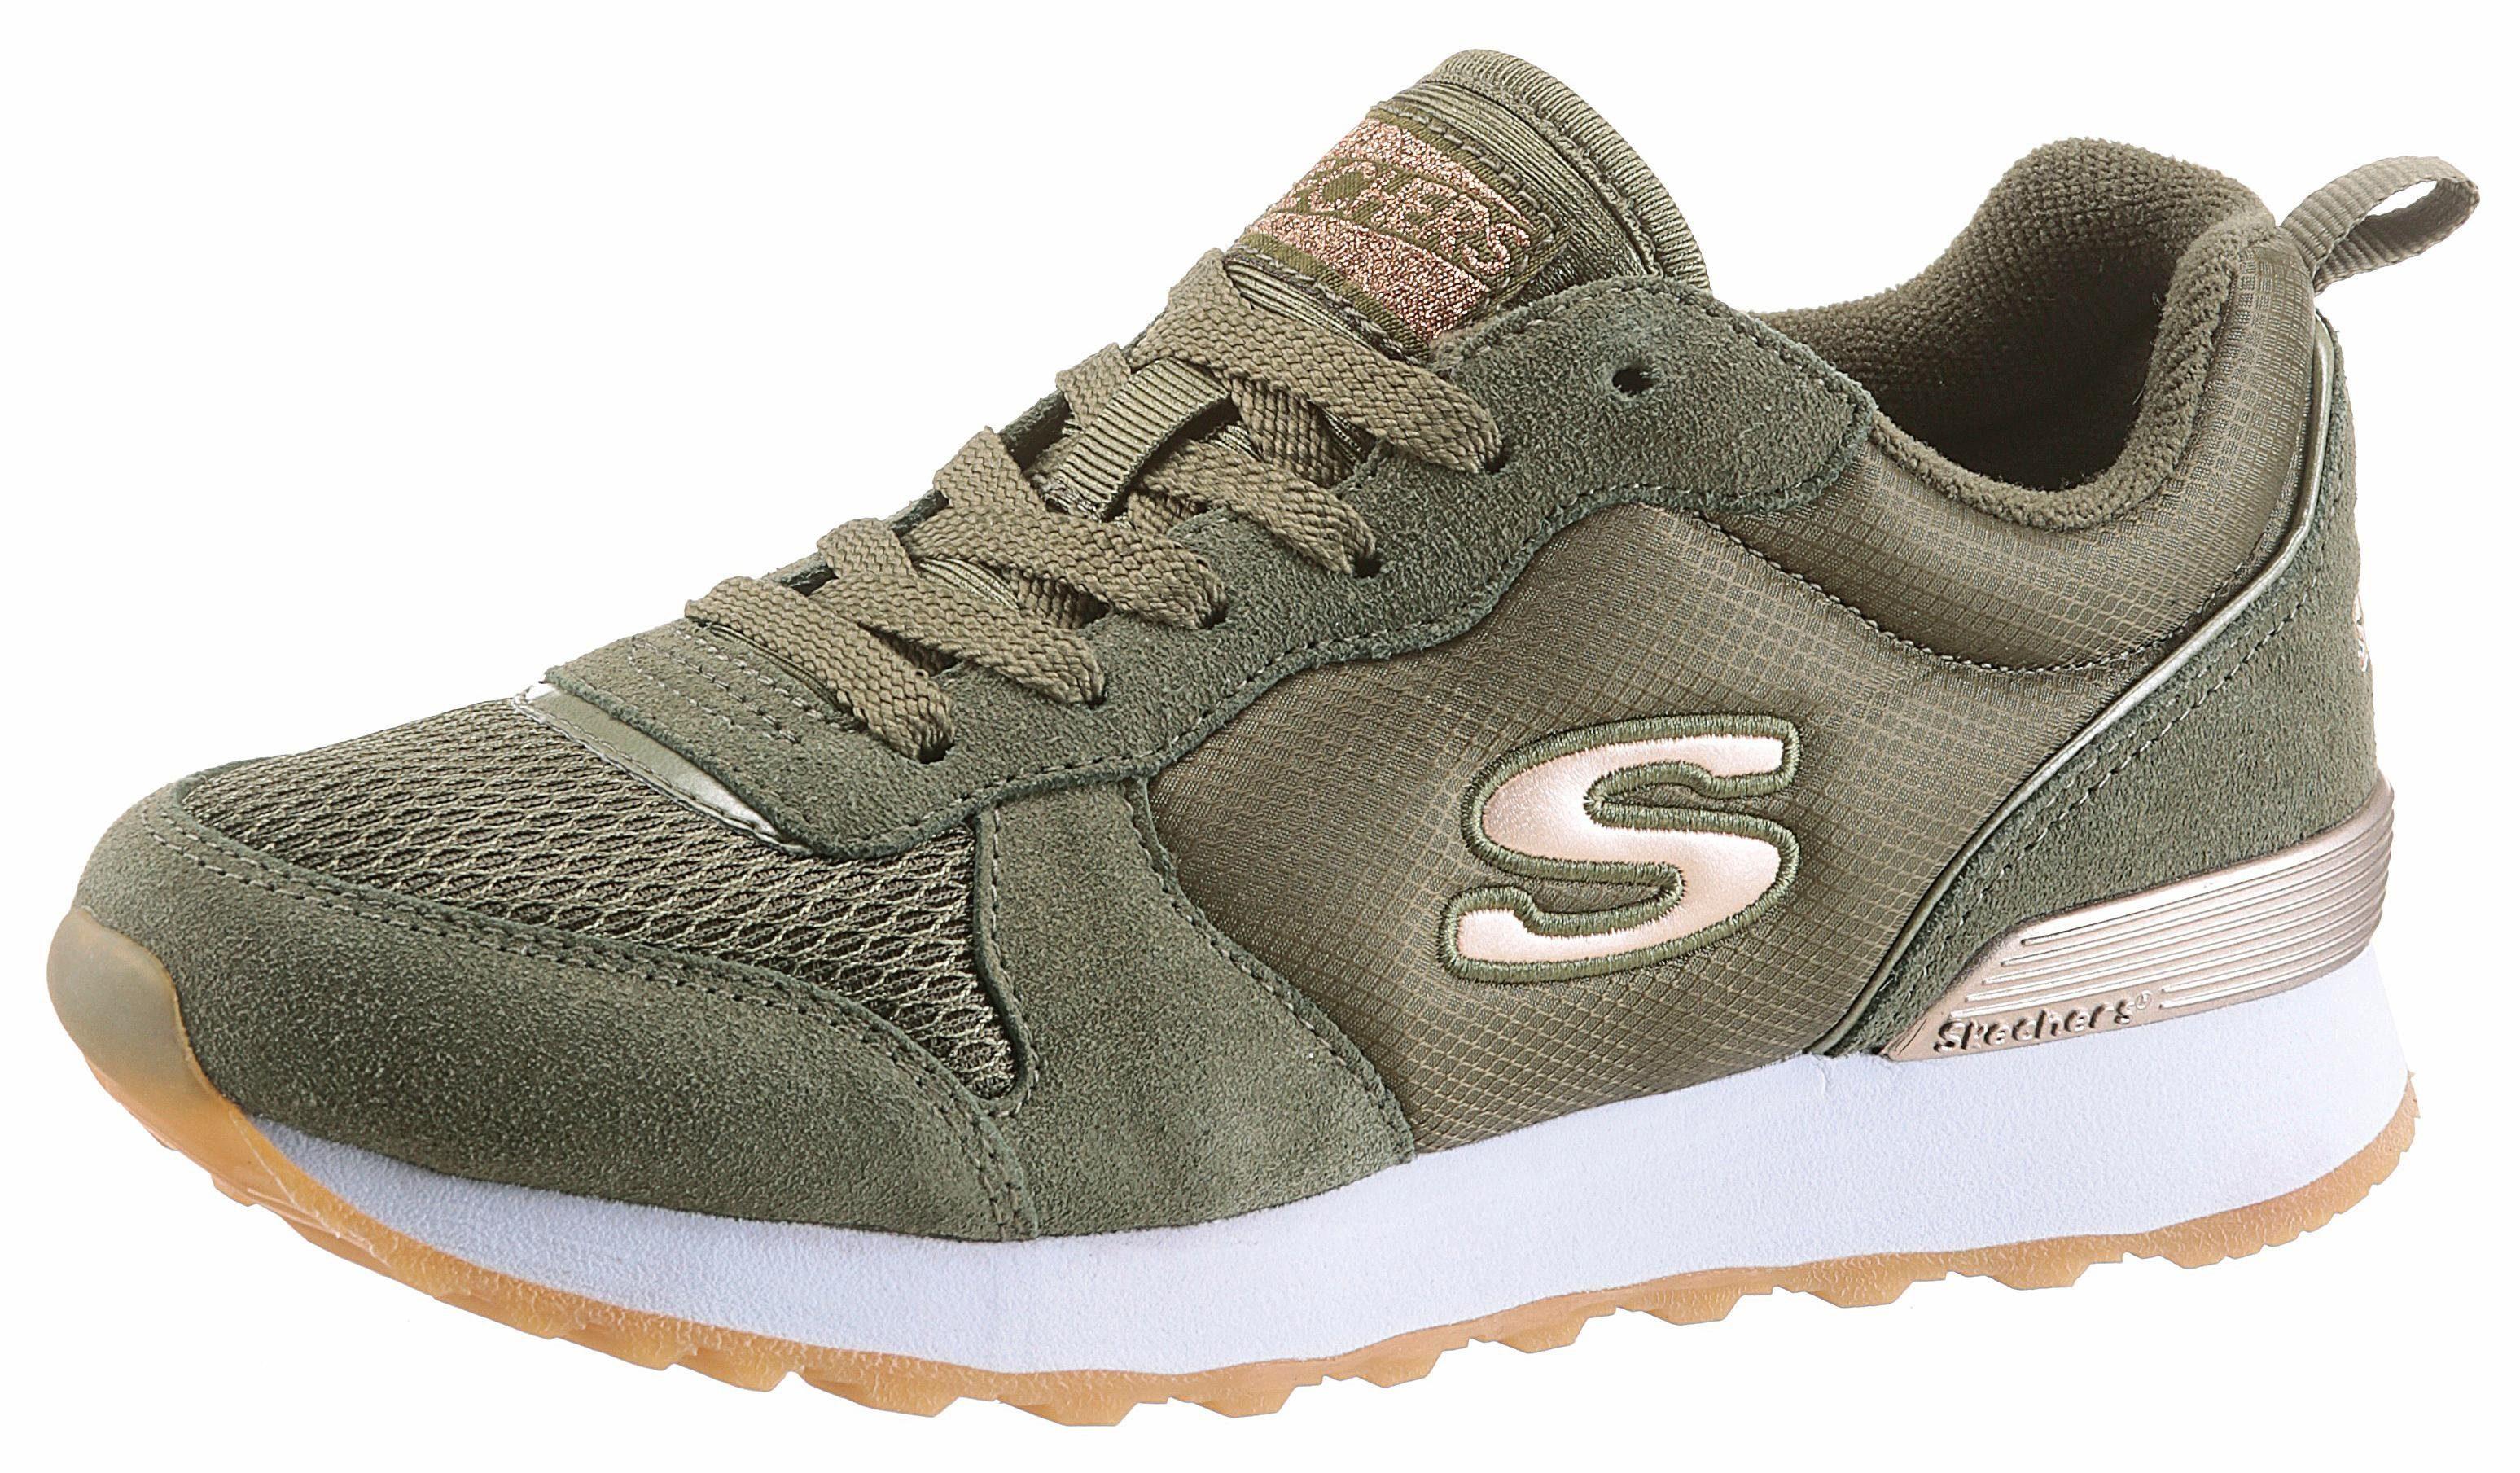 Skechers »GoldN Gurl« Sneaker, mit Memory Foam, schwarz, schwarz-goldfarben